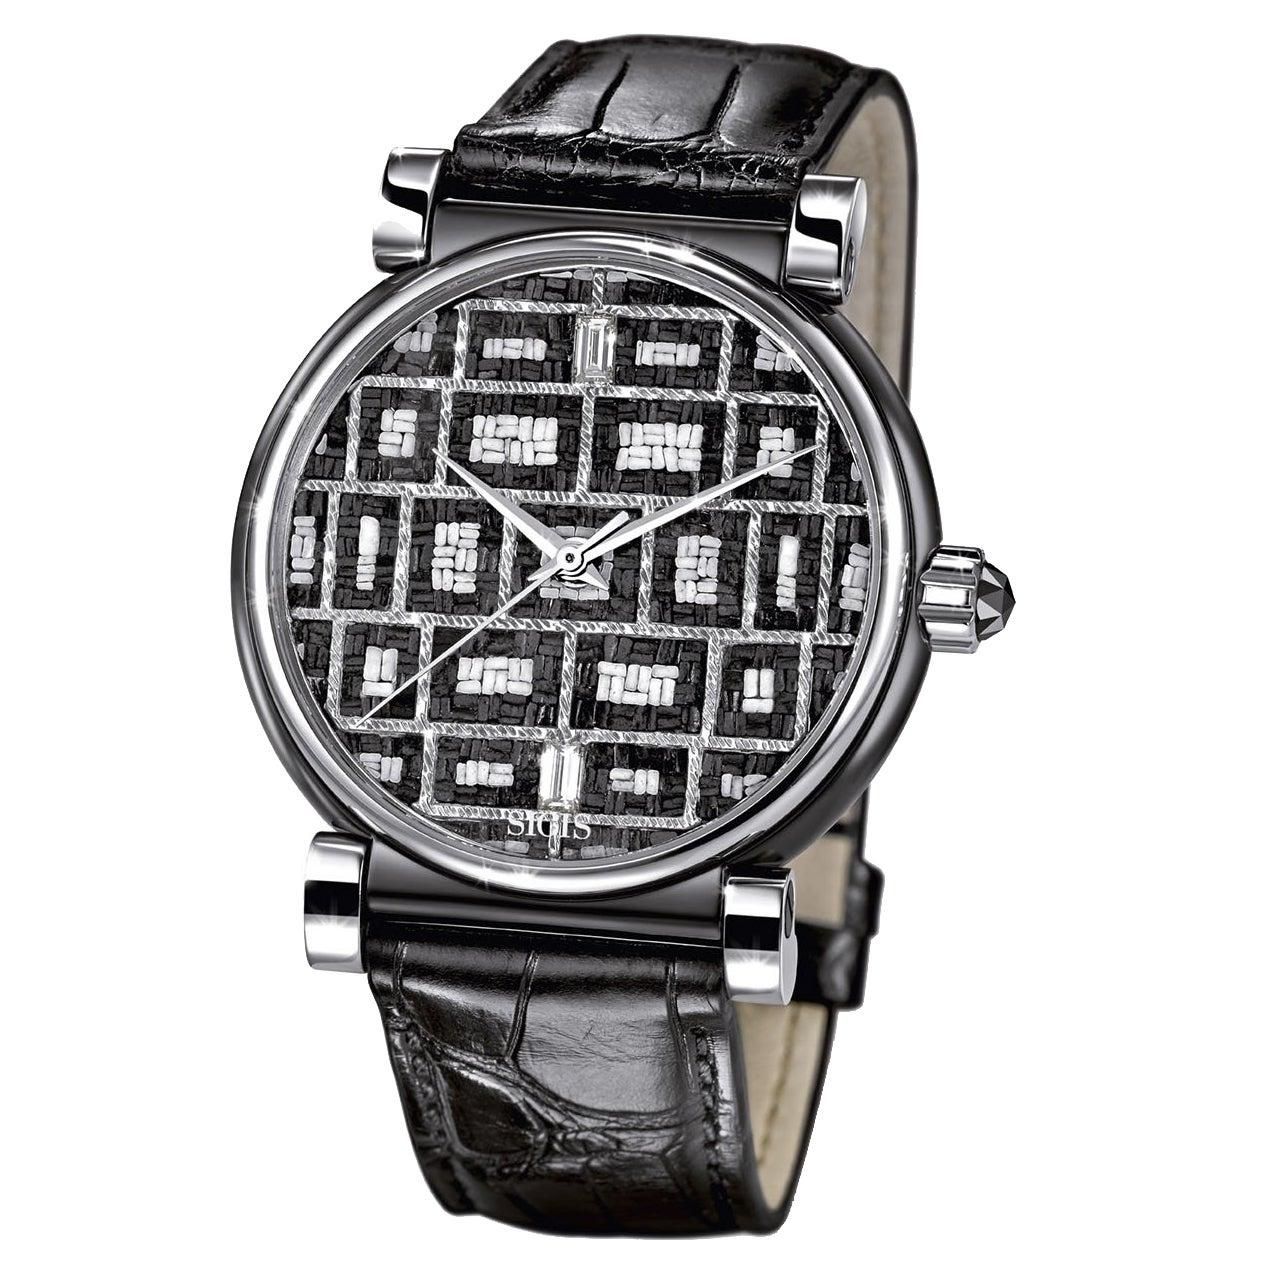 Wristwatch Stainless Steel Case Automatic Movement Black & White Diamonds